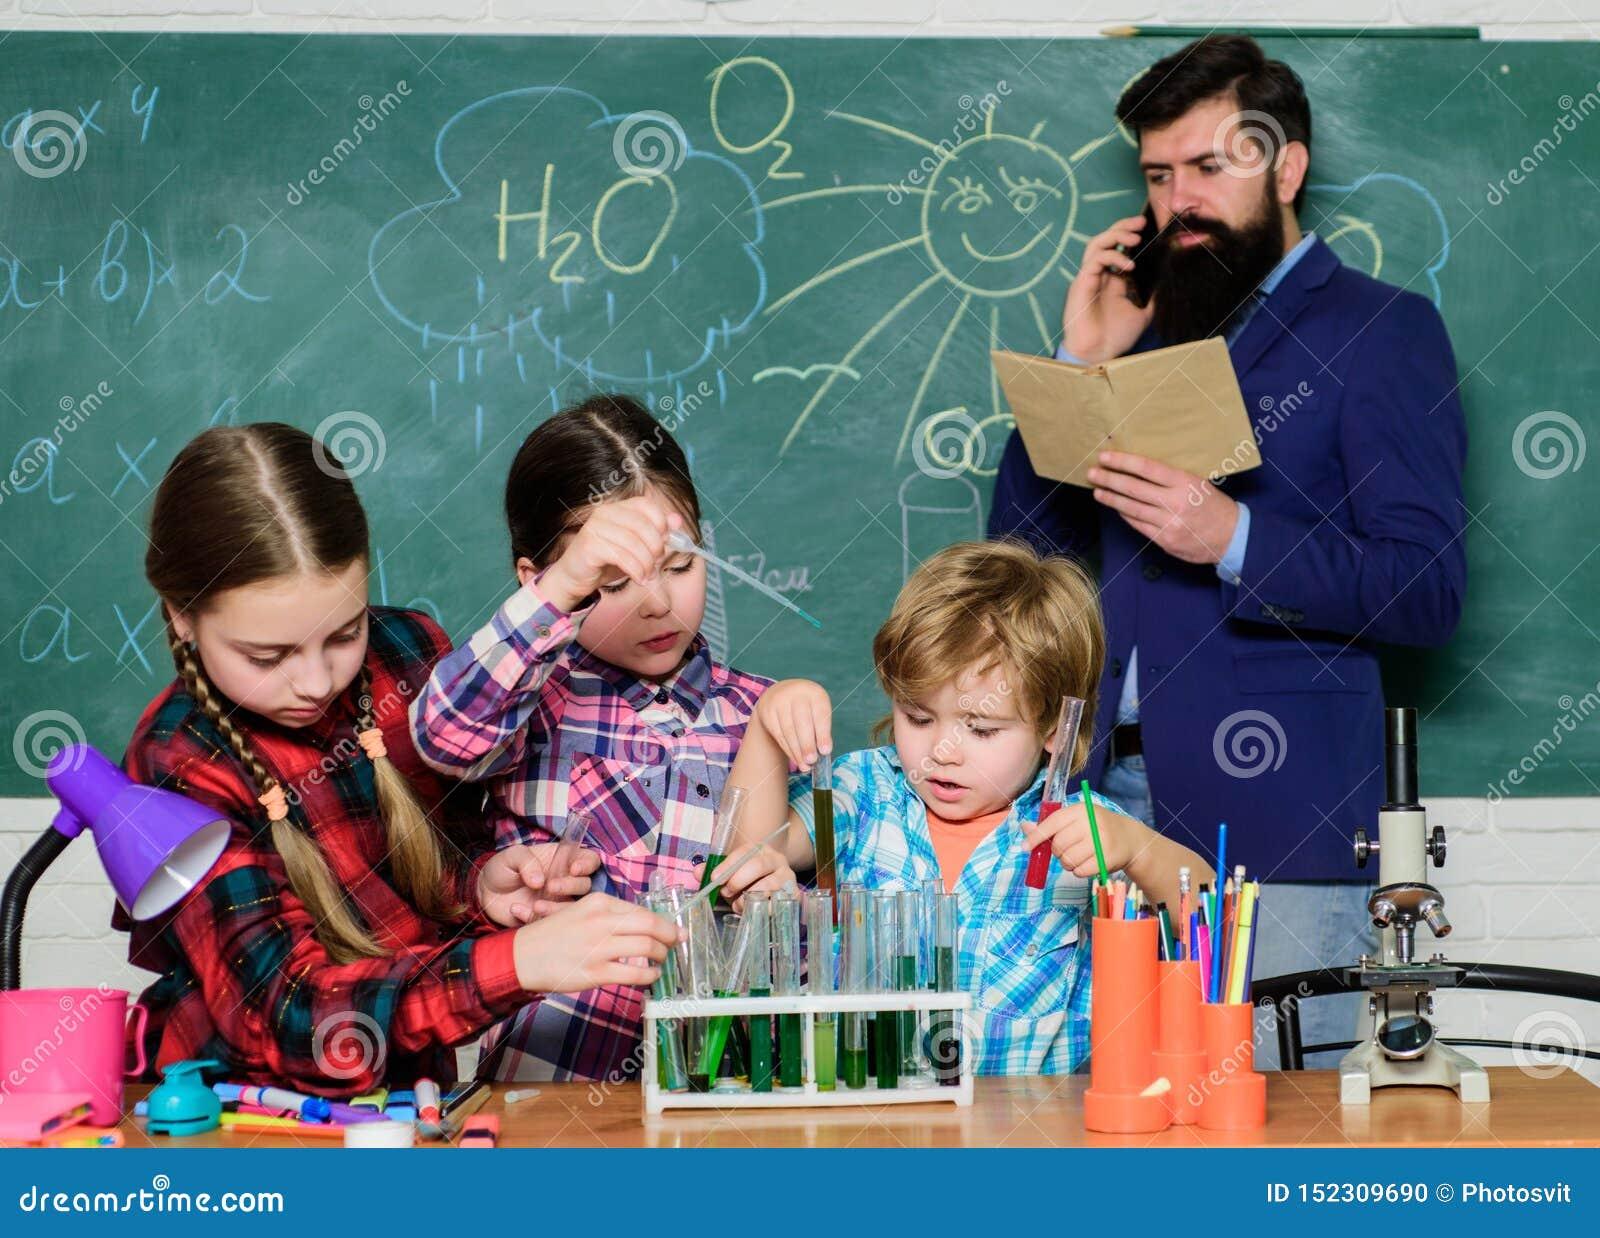 Met ervaring komt kennis formeel onderwijs Chemieklassen Groepsinteractie en mededeling bevorder